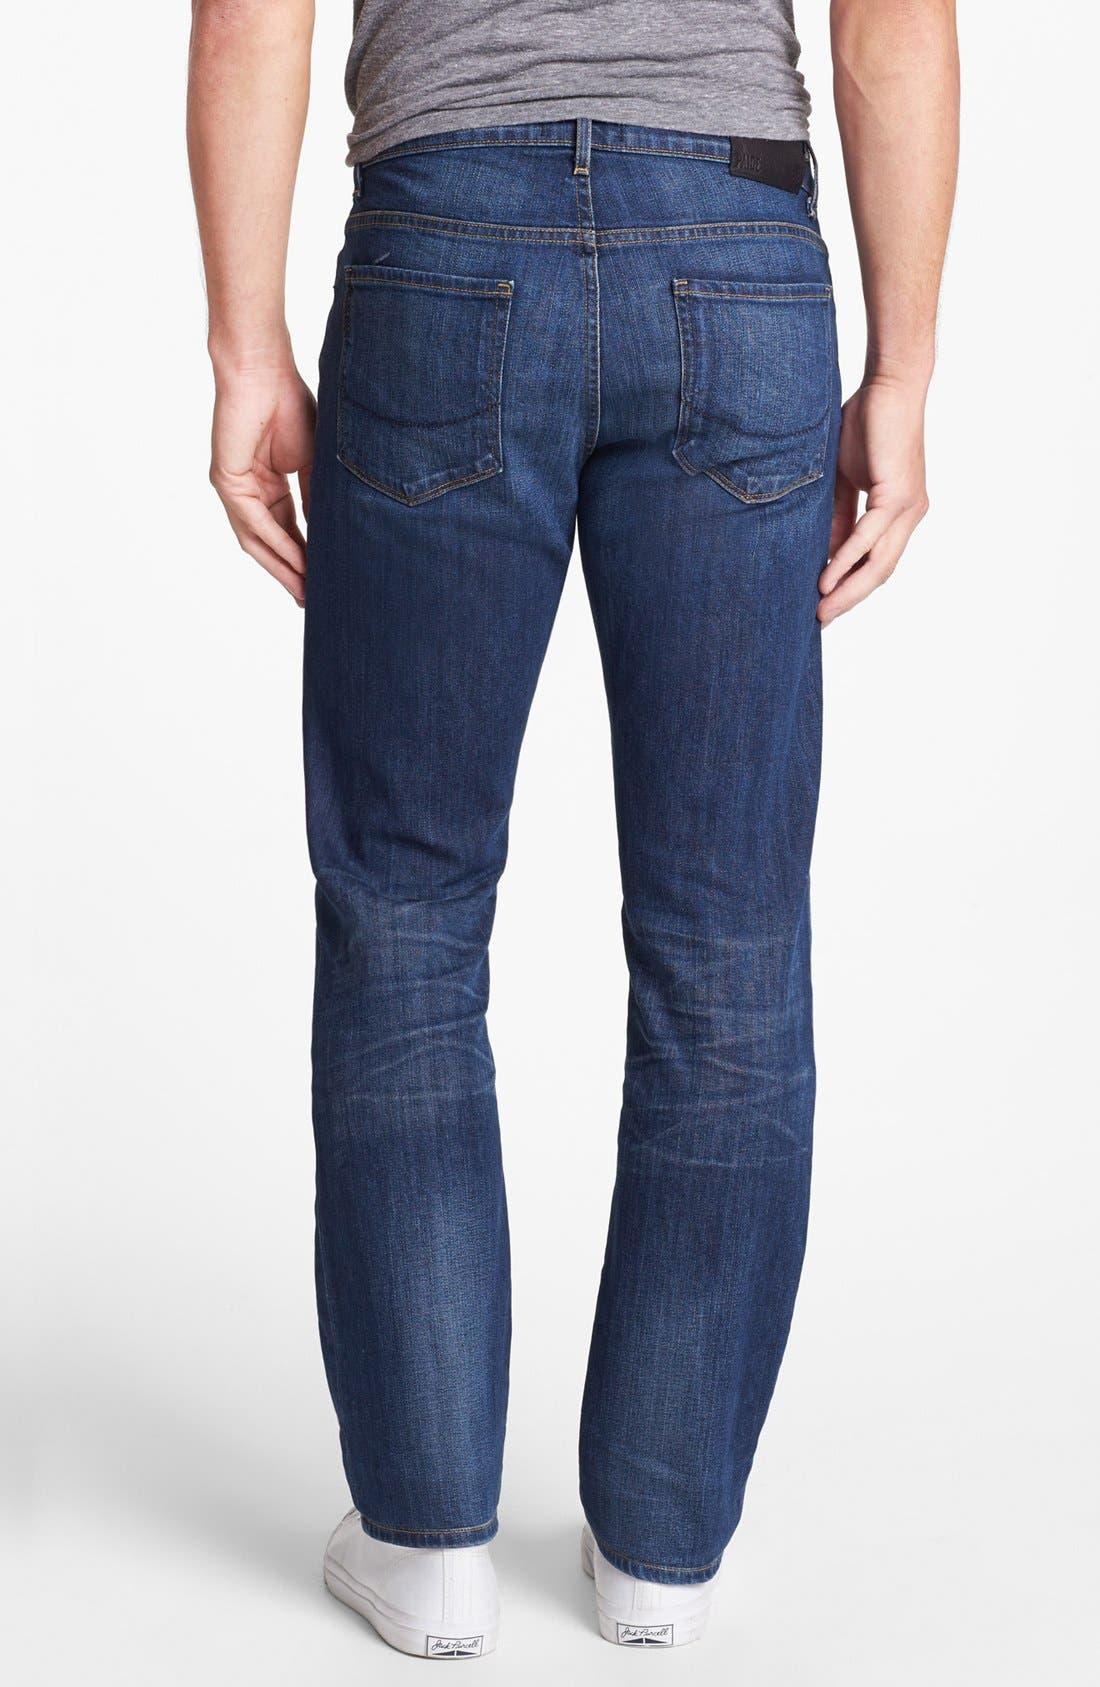 Main Image - PAIGE 'Normandie' Slim Fit Jeans (Knuckle)